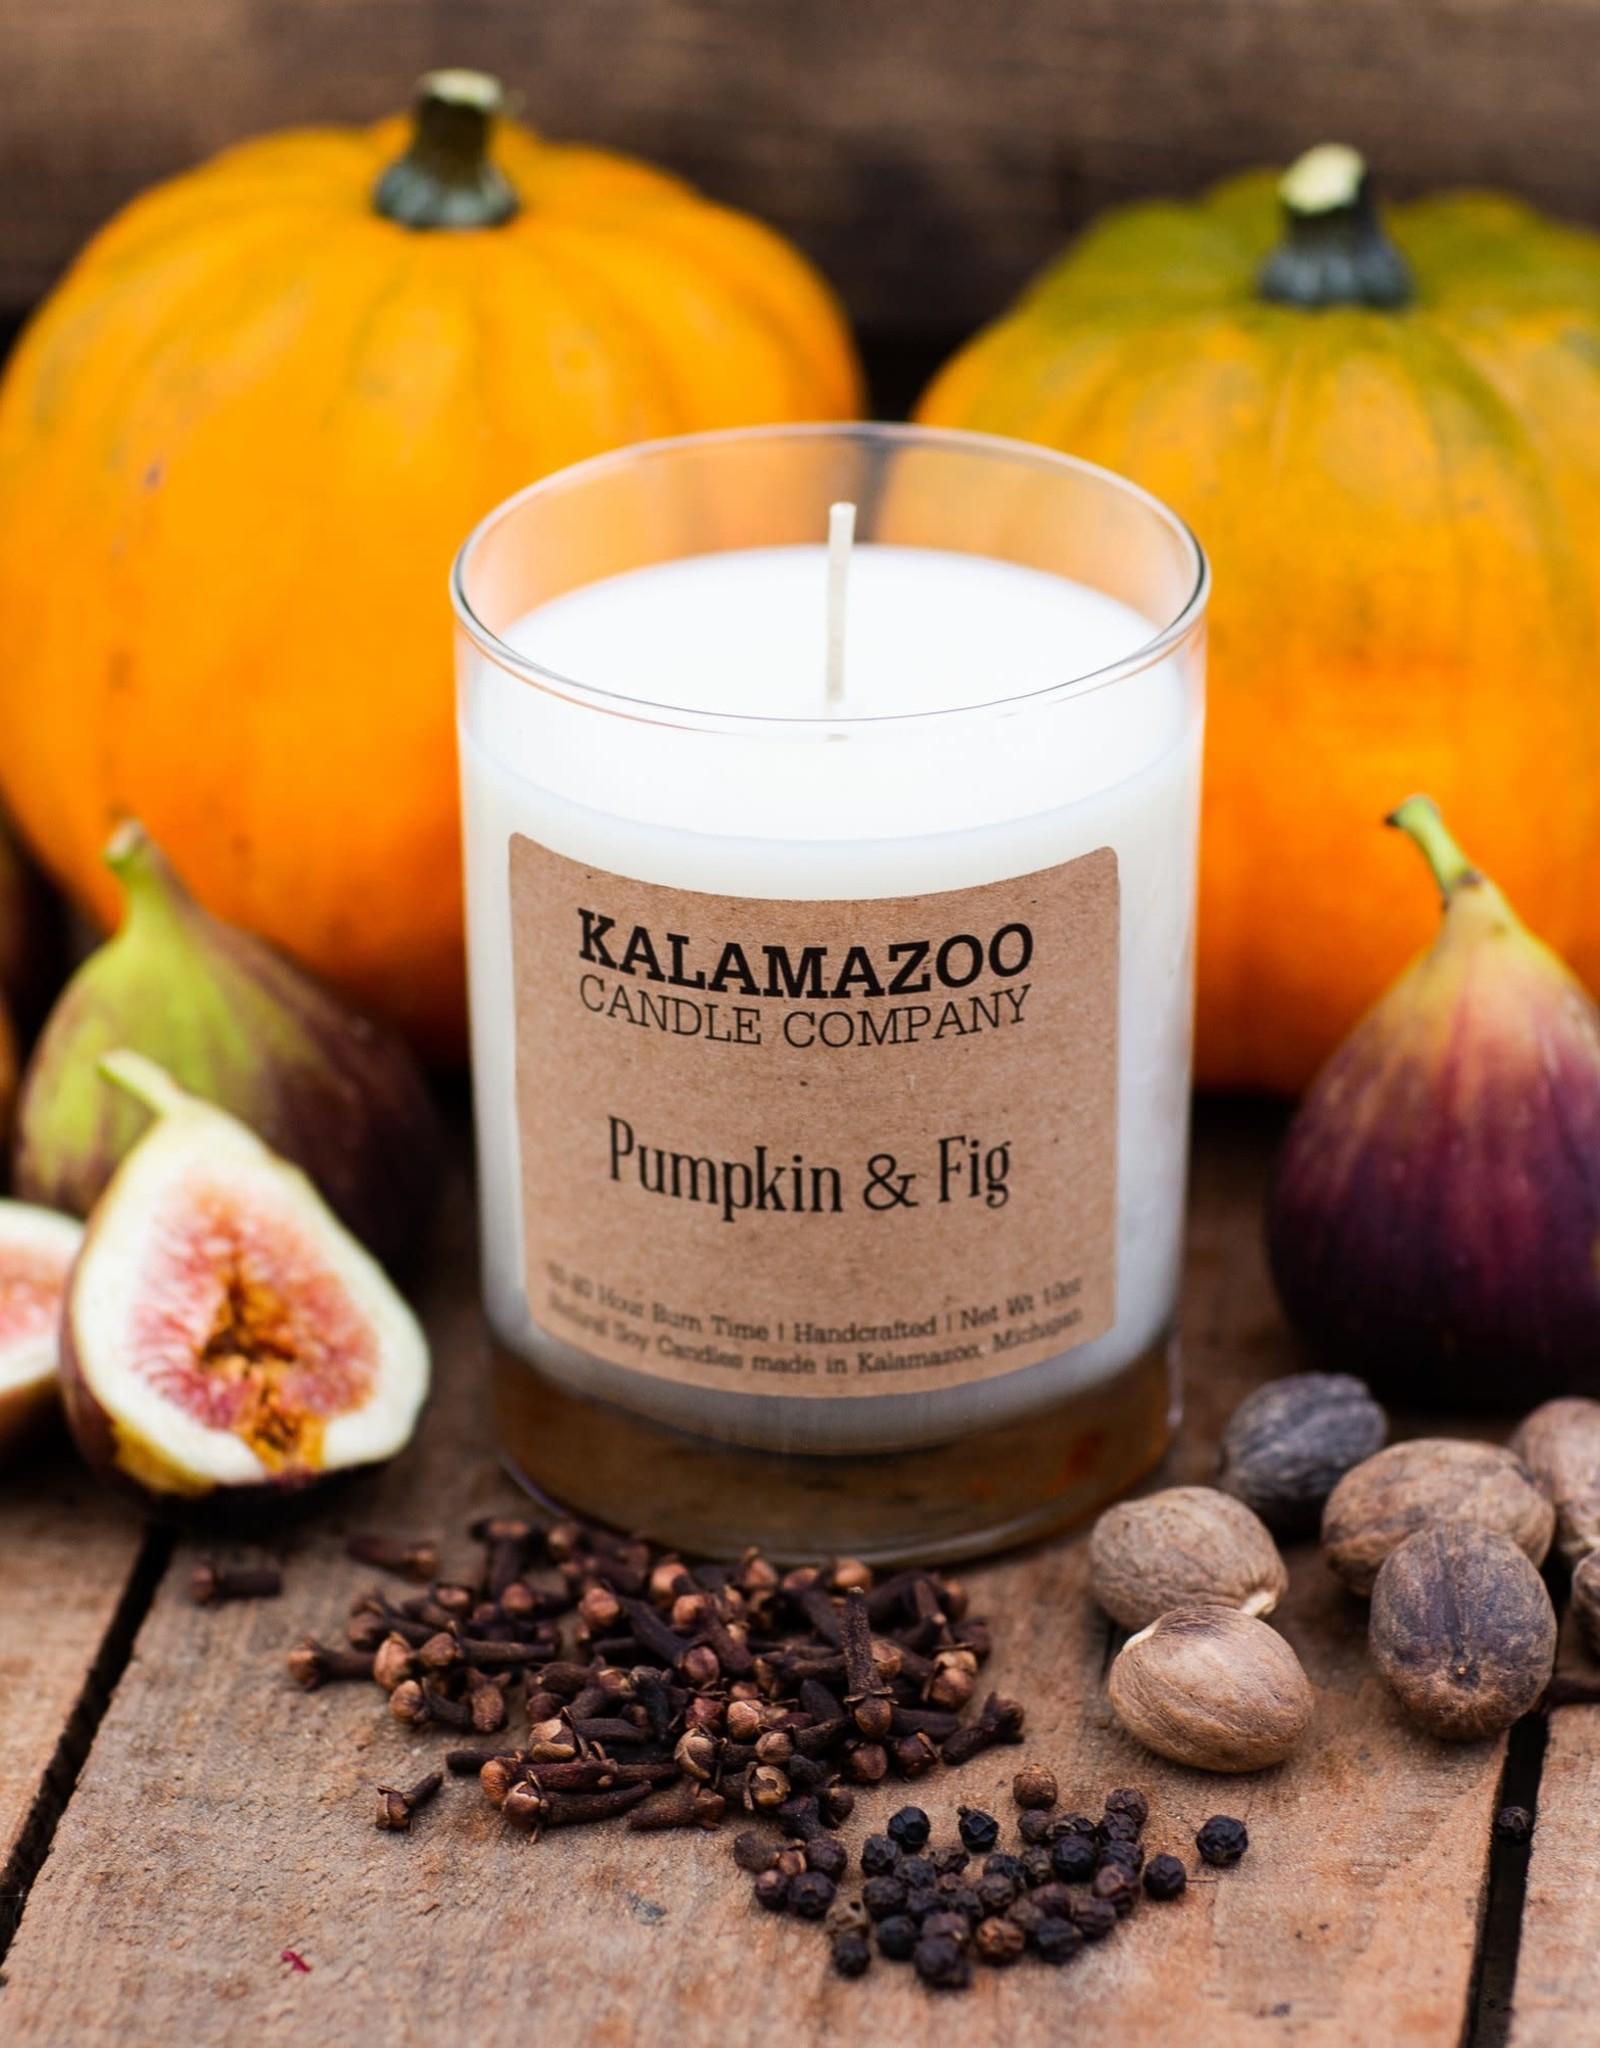 Kalamazoo Candle Co. Kalamazoo Candle Co. | Pumpkin & Fig 10oz Jar